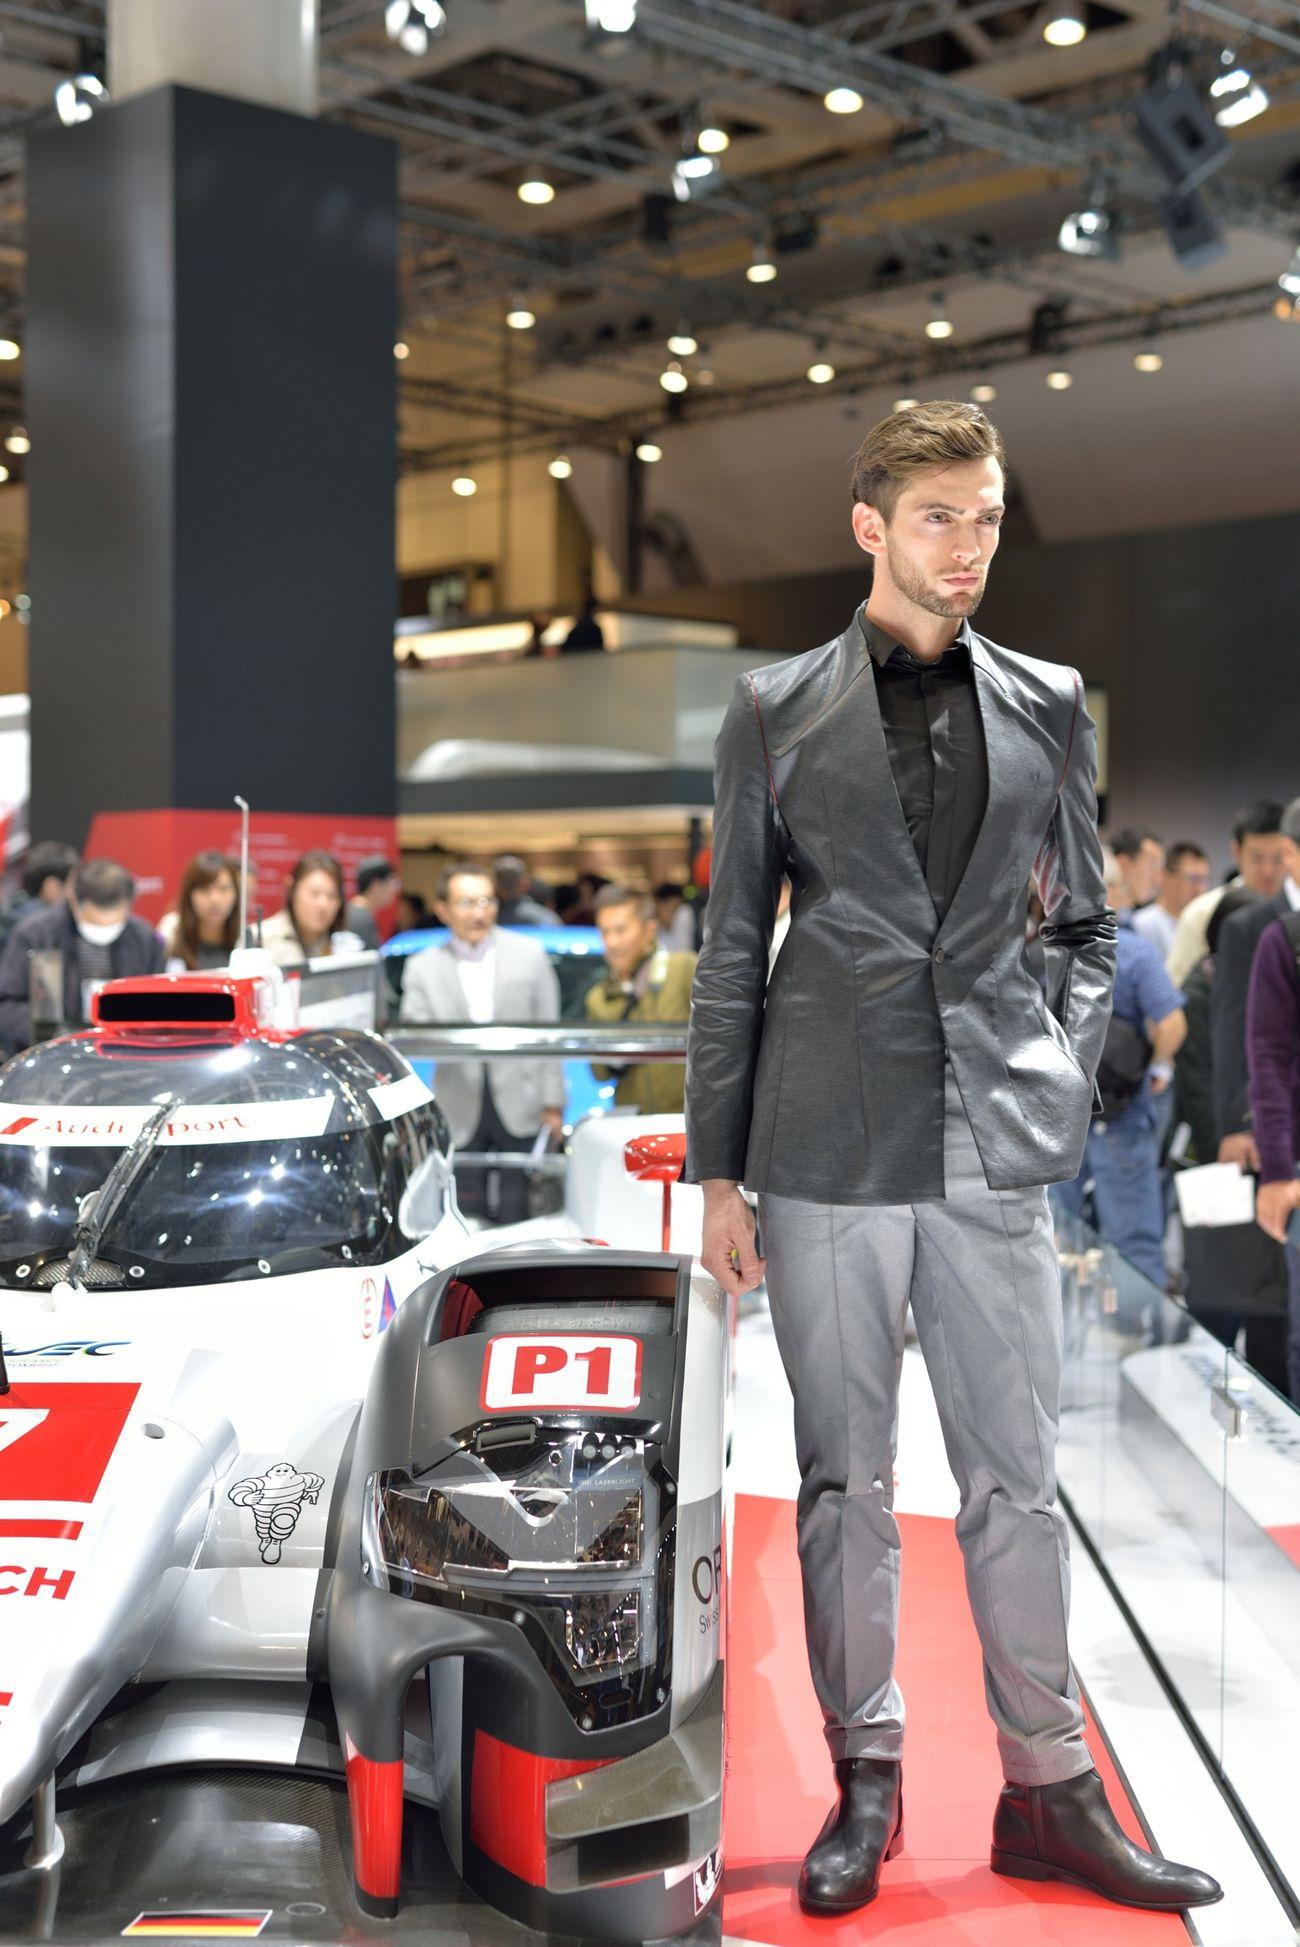 Tokyomotorshow2015 東京モーターショー2015 CarShow Car Model Model Pose Model Shoot Guy Modeling Cool